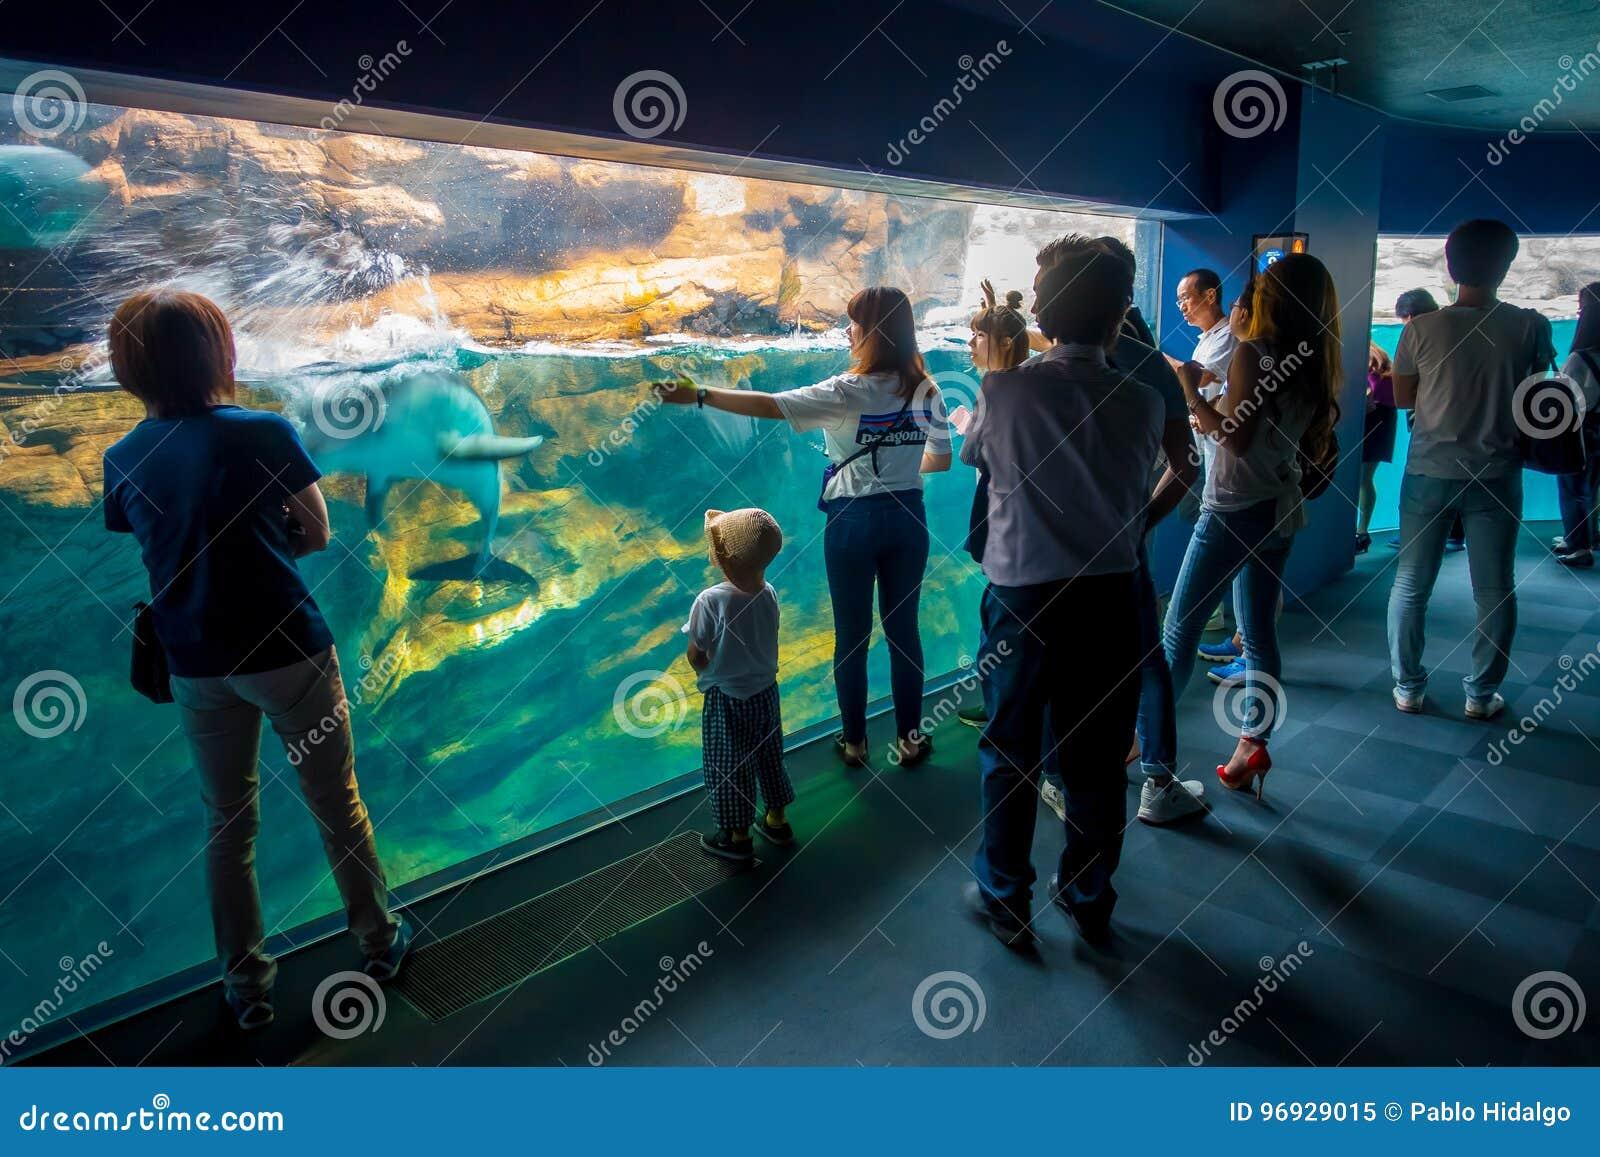 OSAKA, JAPAN - JULI 18, 2017: Dolfijn in Osaka Aquarium Kaiyukan, één van de grootste openbare aquariums in de wereld binnen